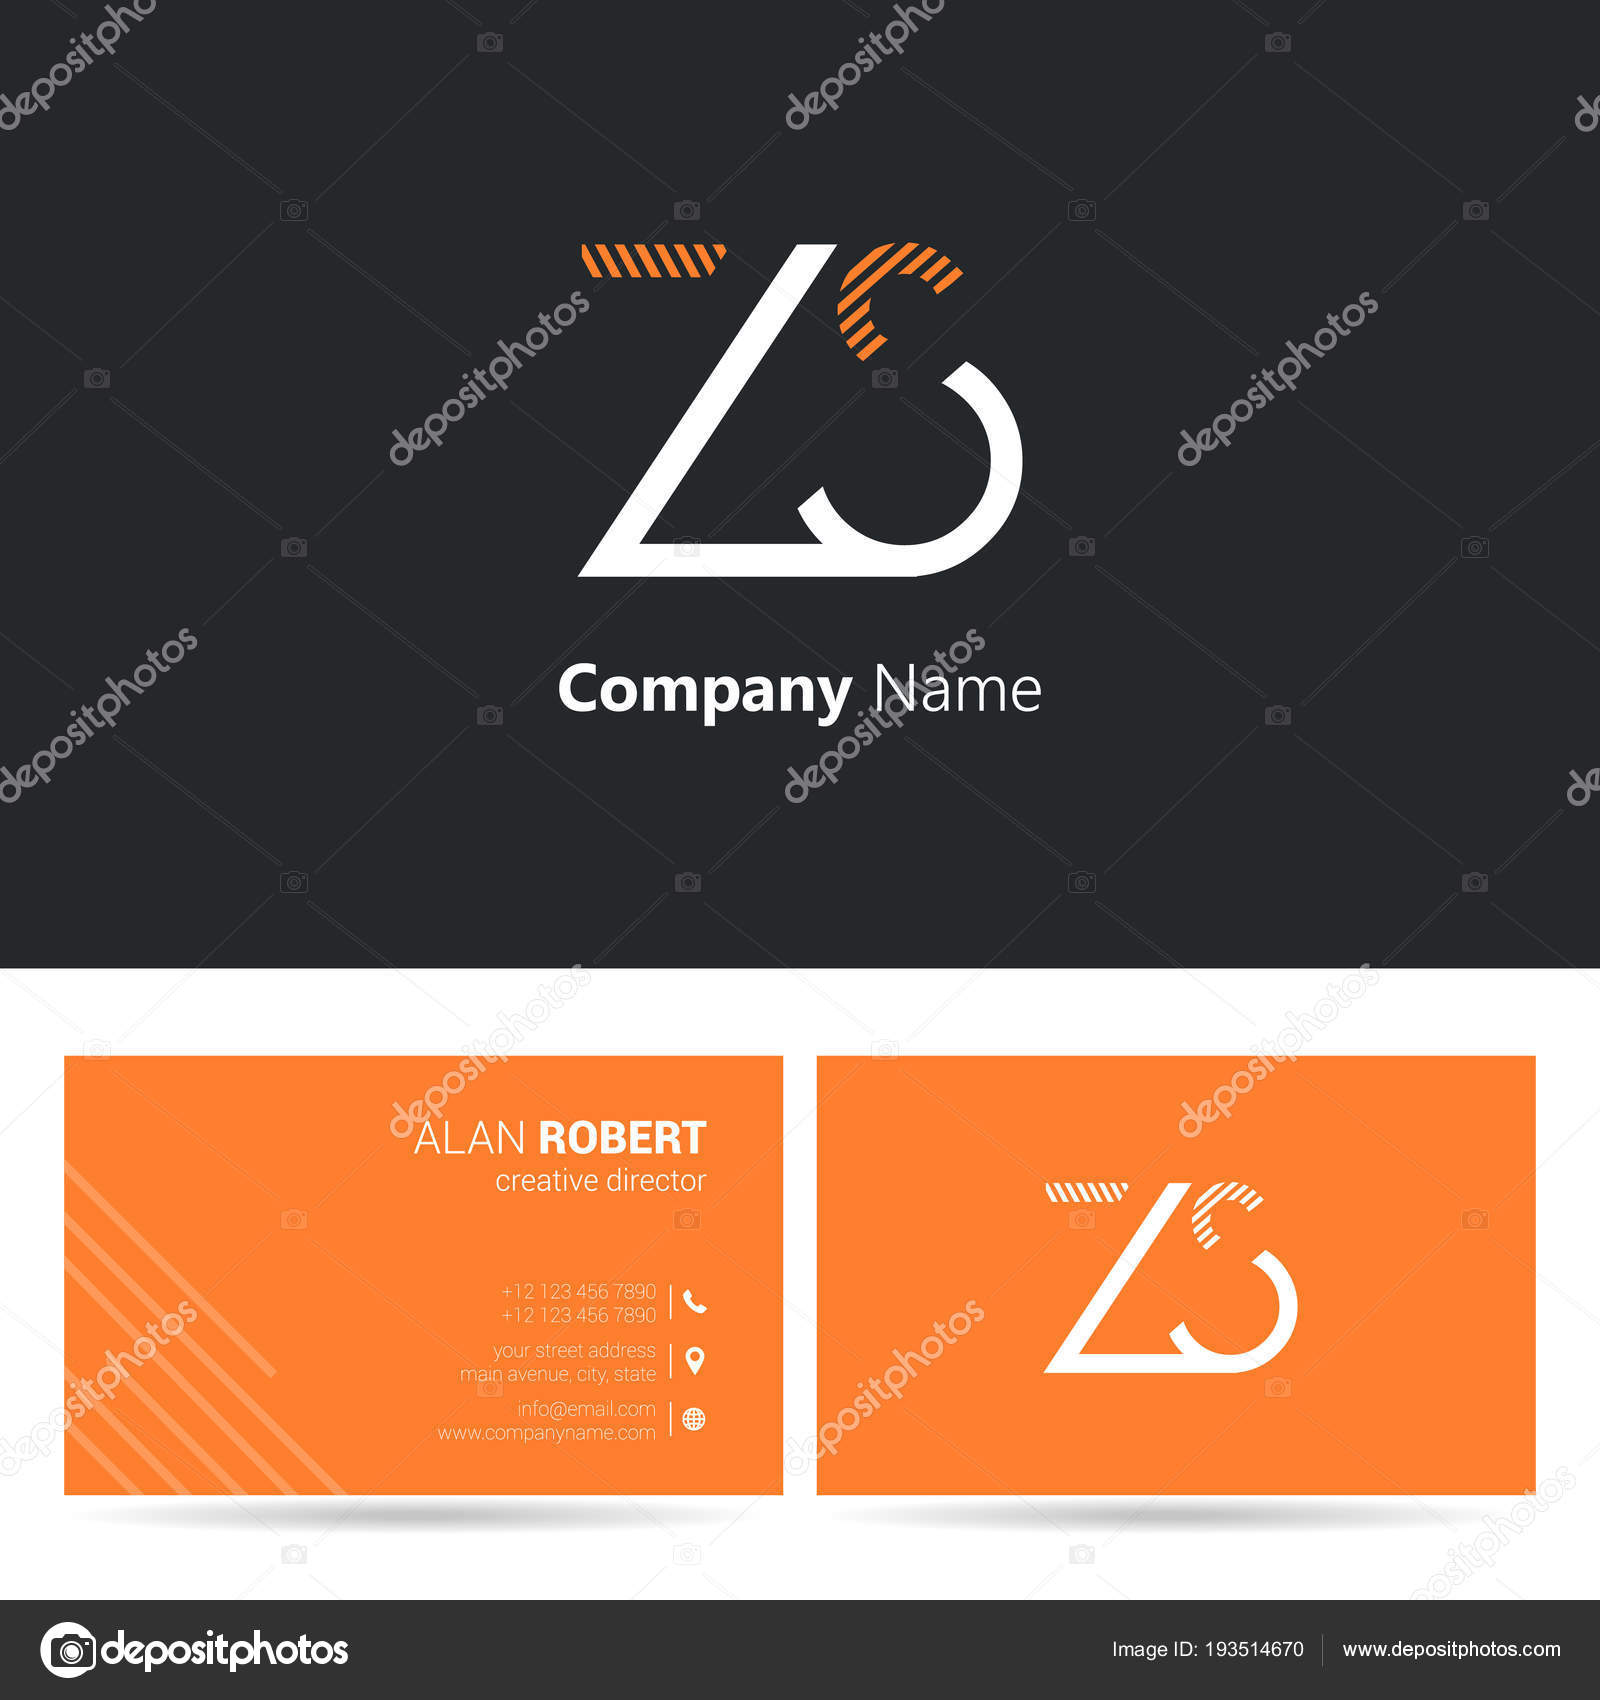 Plantilla Diseño Tarjetas Logo Negro Naranja Con Ondulado Letras ...